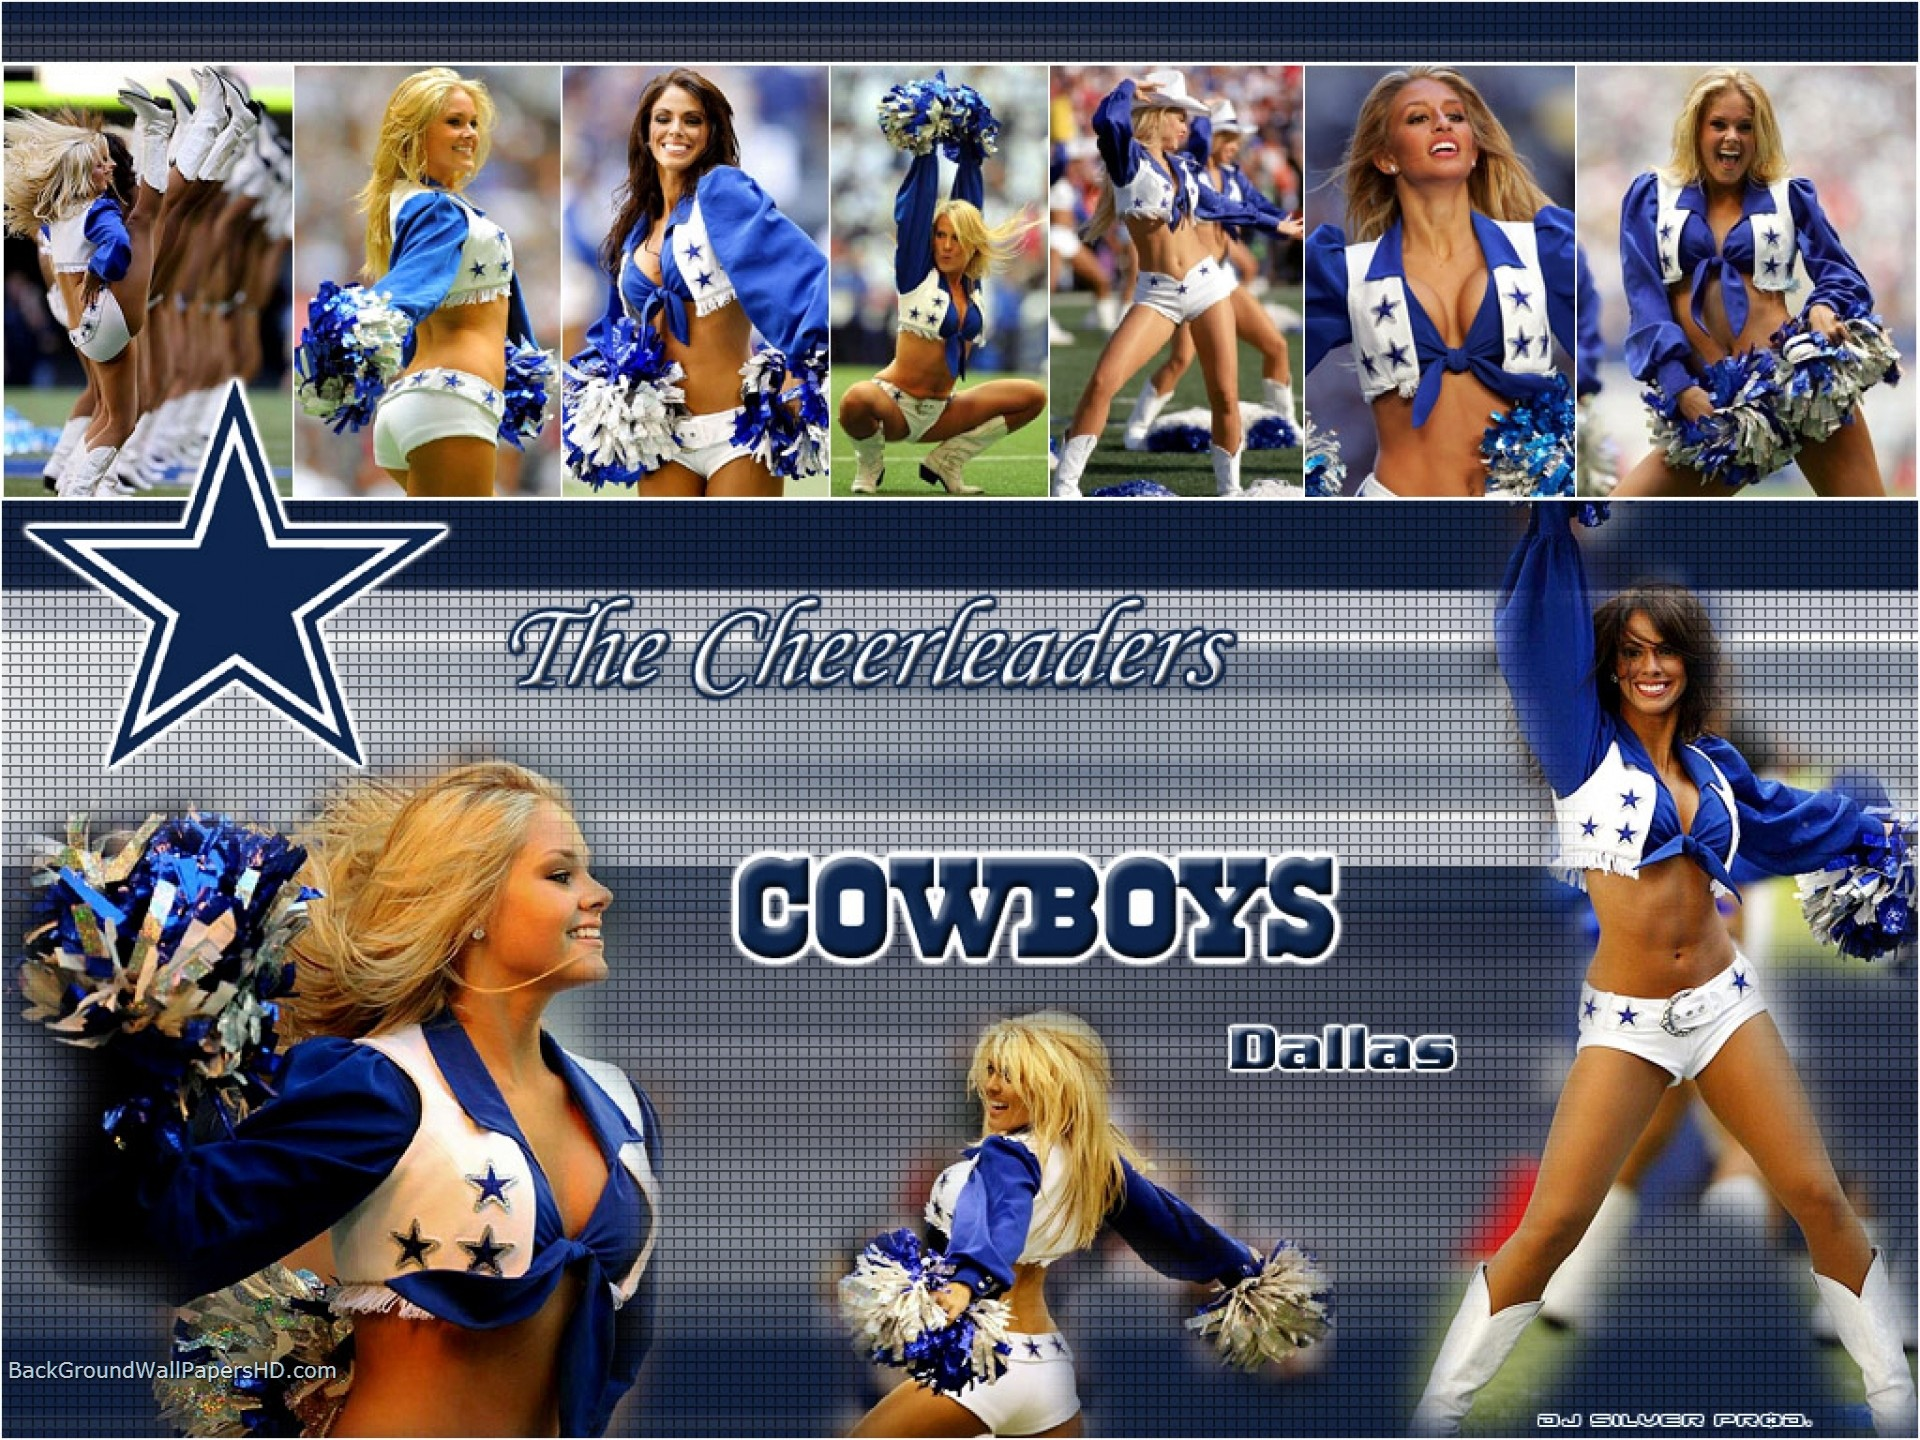 Cowboys Cheerleaders HD Wallpaper   HD Wallpapers, HD Backgrounds .